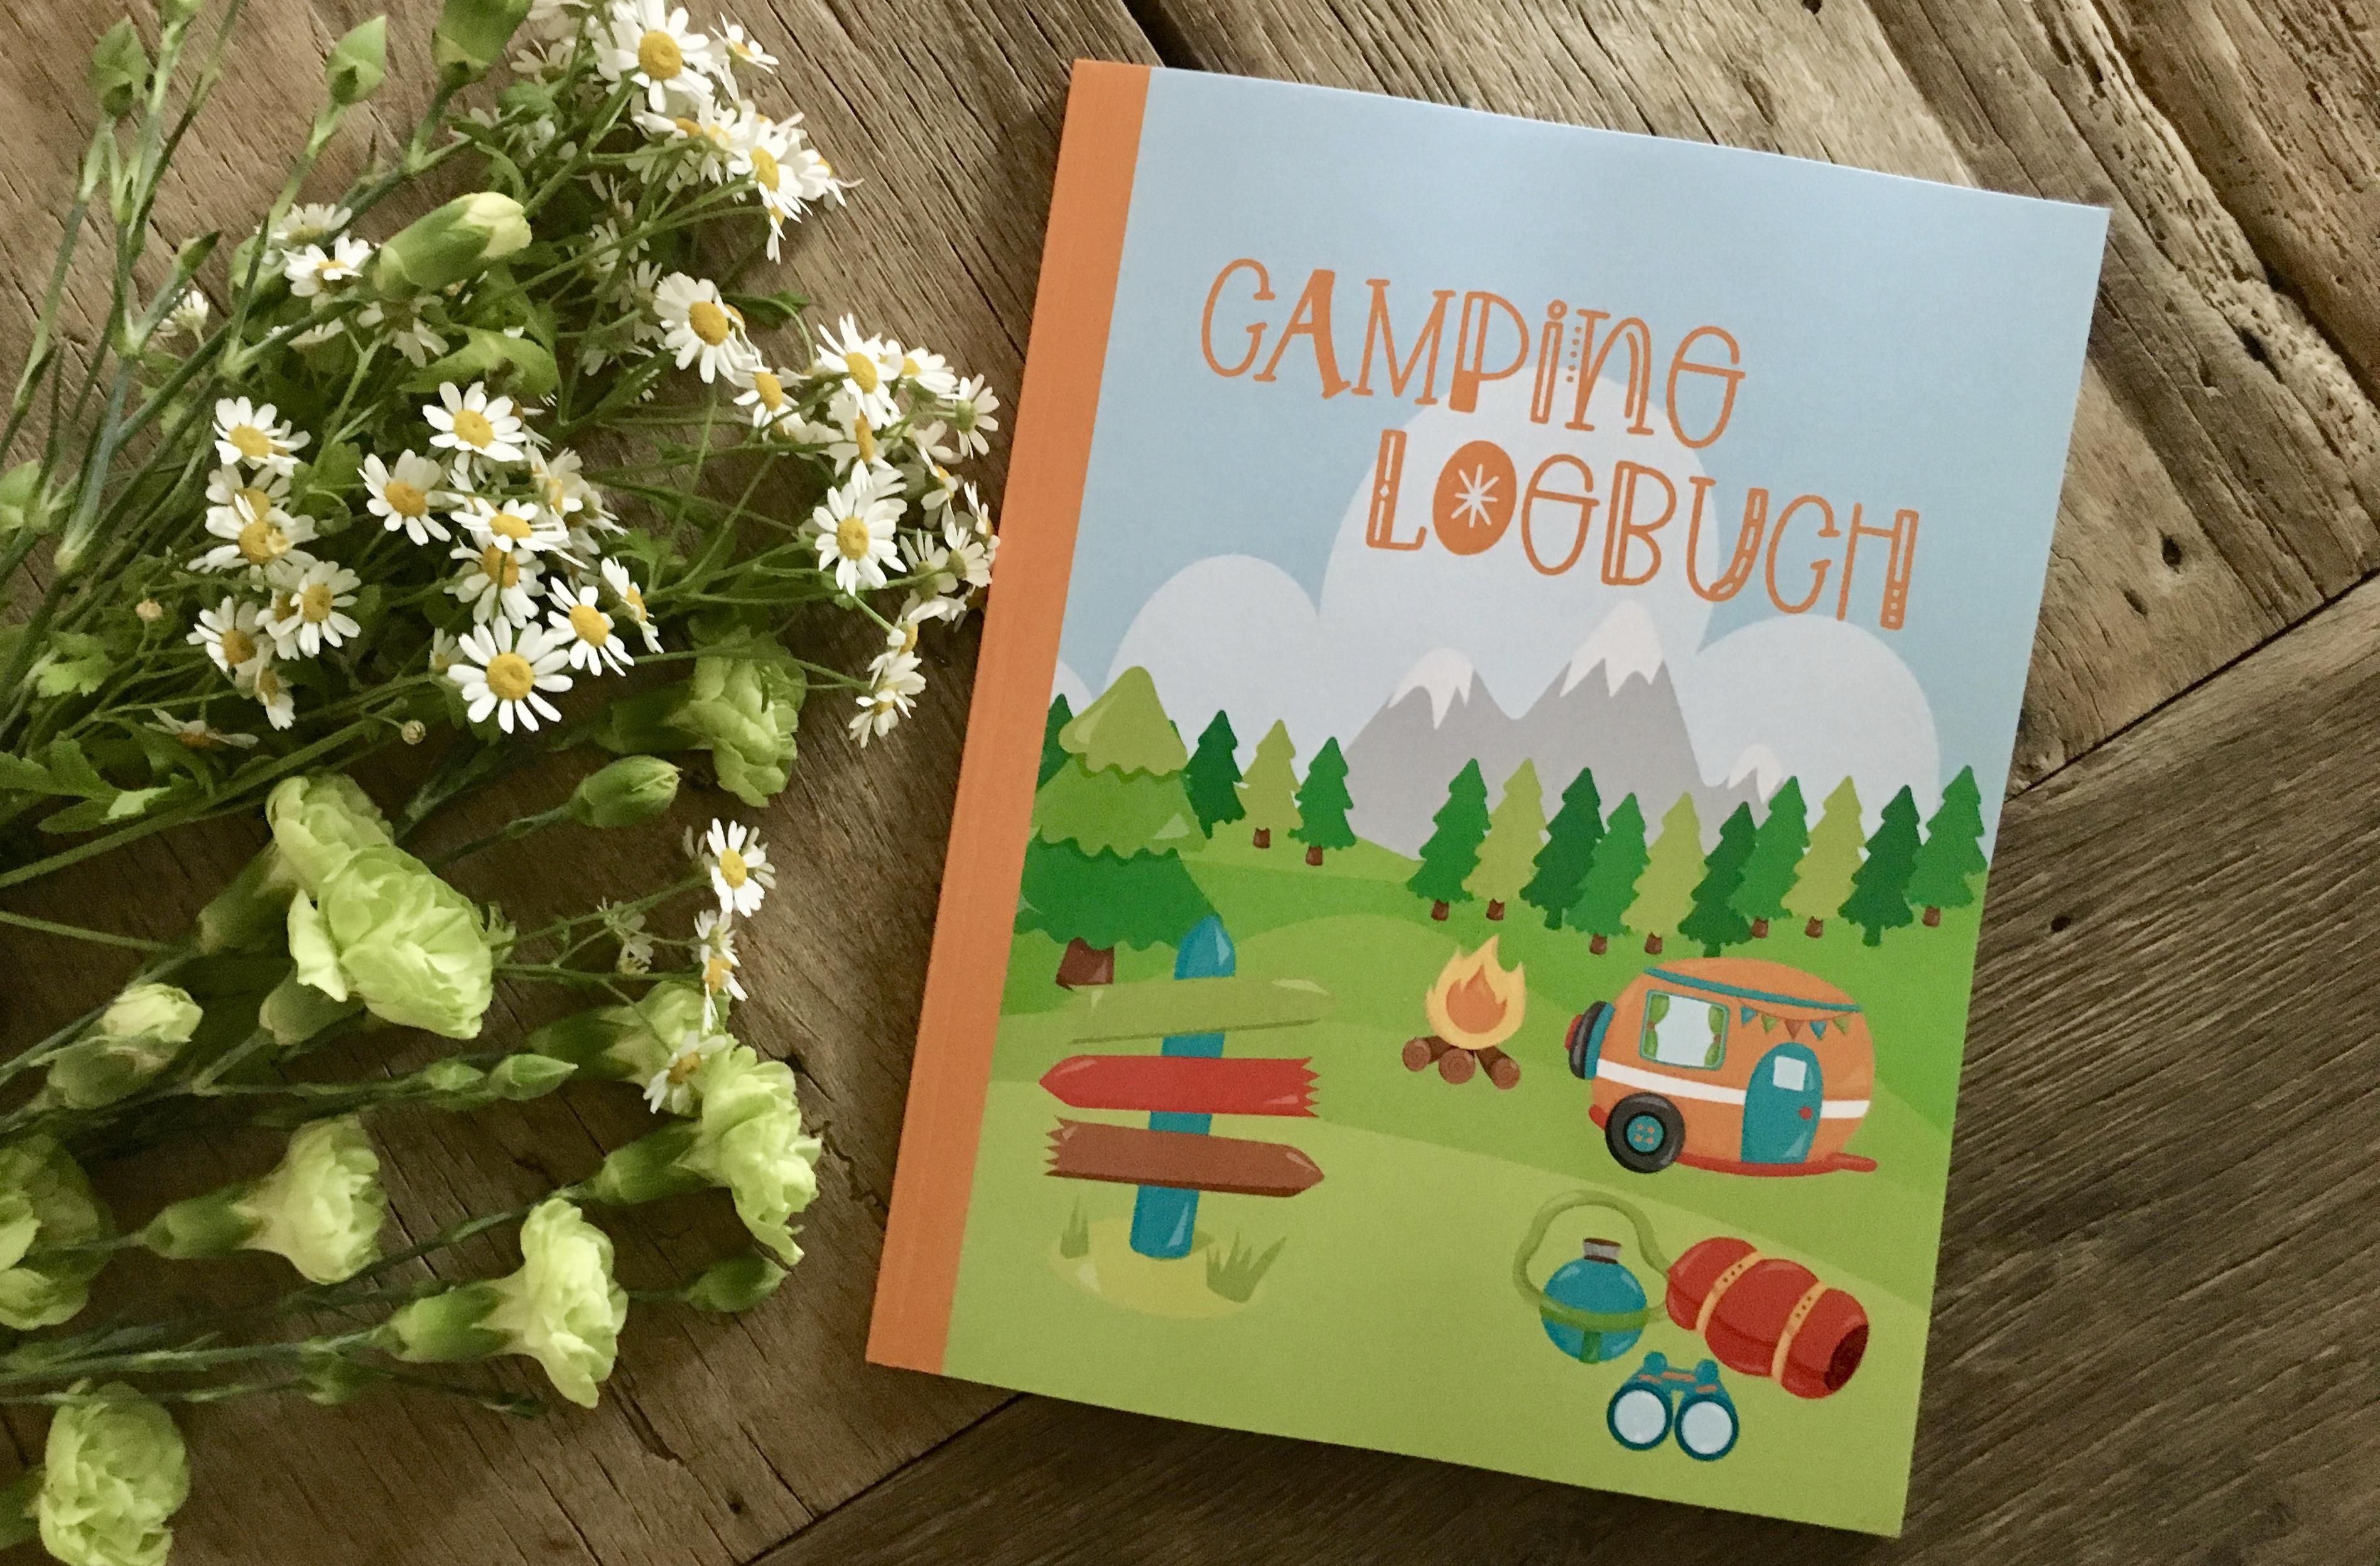 Camping Logbuch